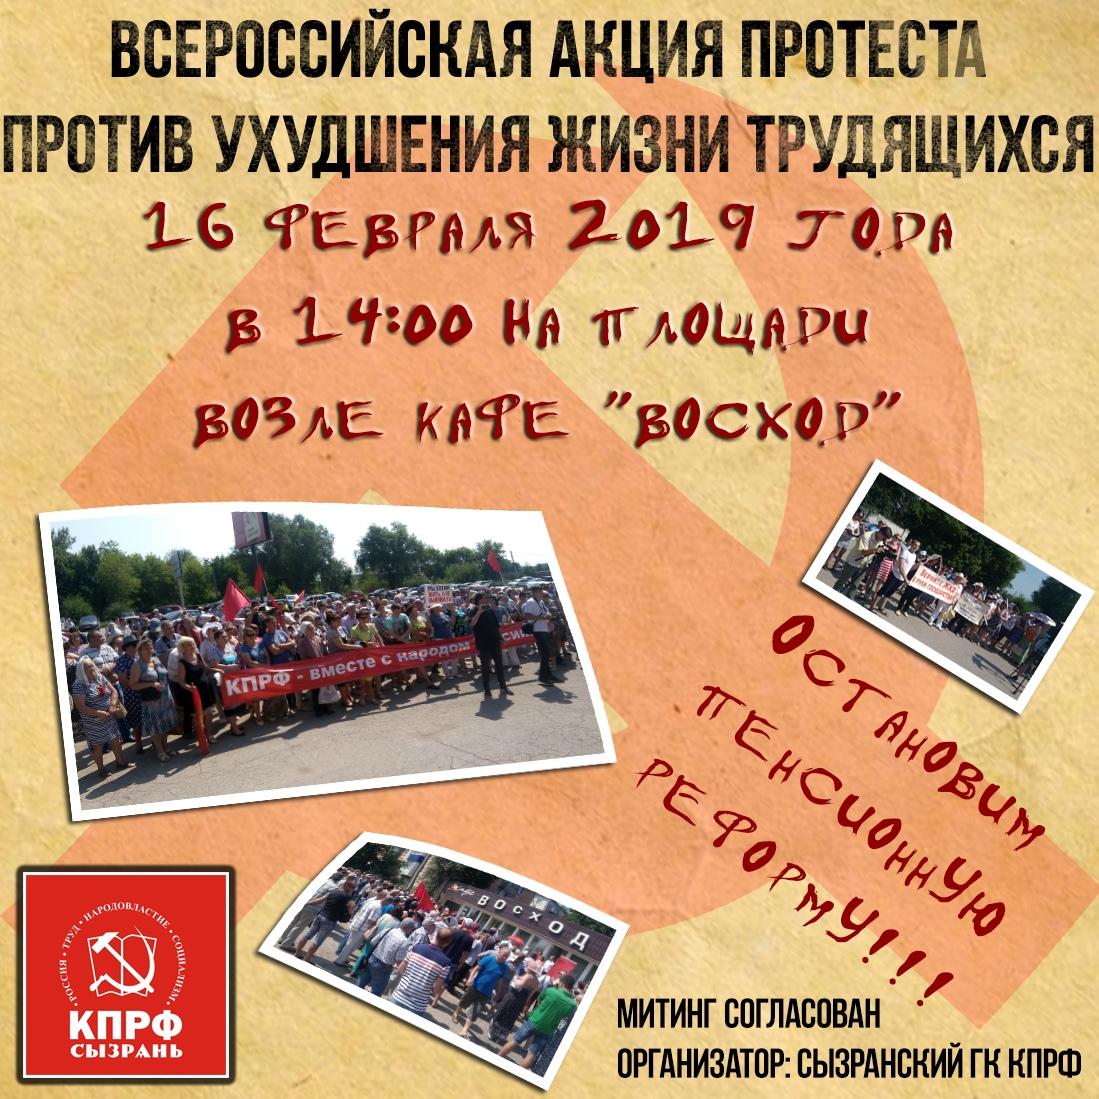 Митинг КПРФ Сызрань 16 февраля 2019